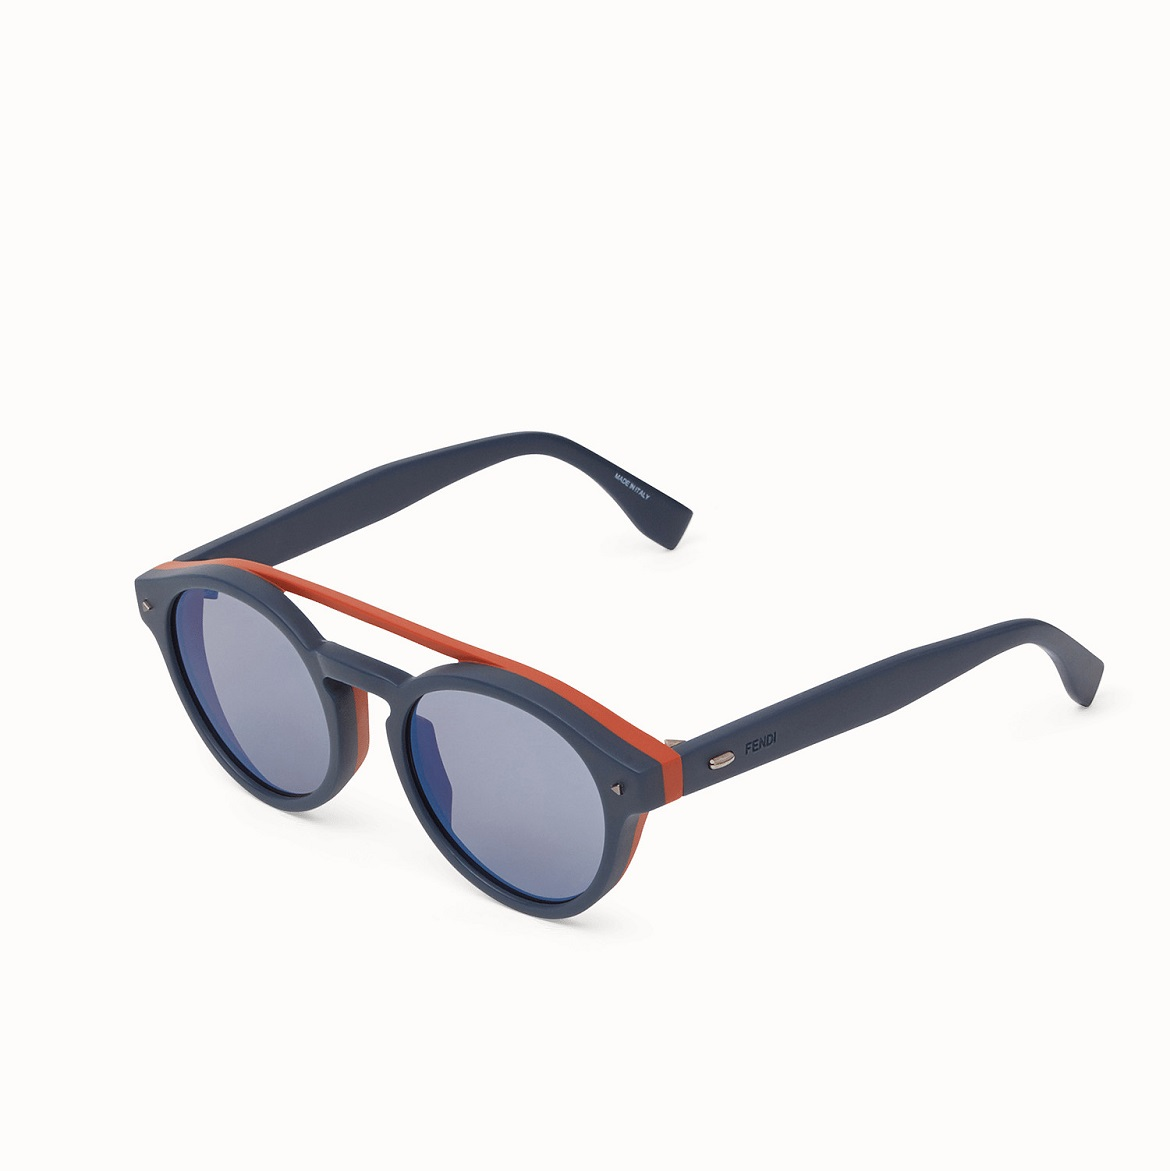 bc89a1757d Τα επιβλητικά γυαλιά ηλίου του οίκου Fendi -  dimitrisgoes